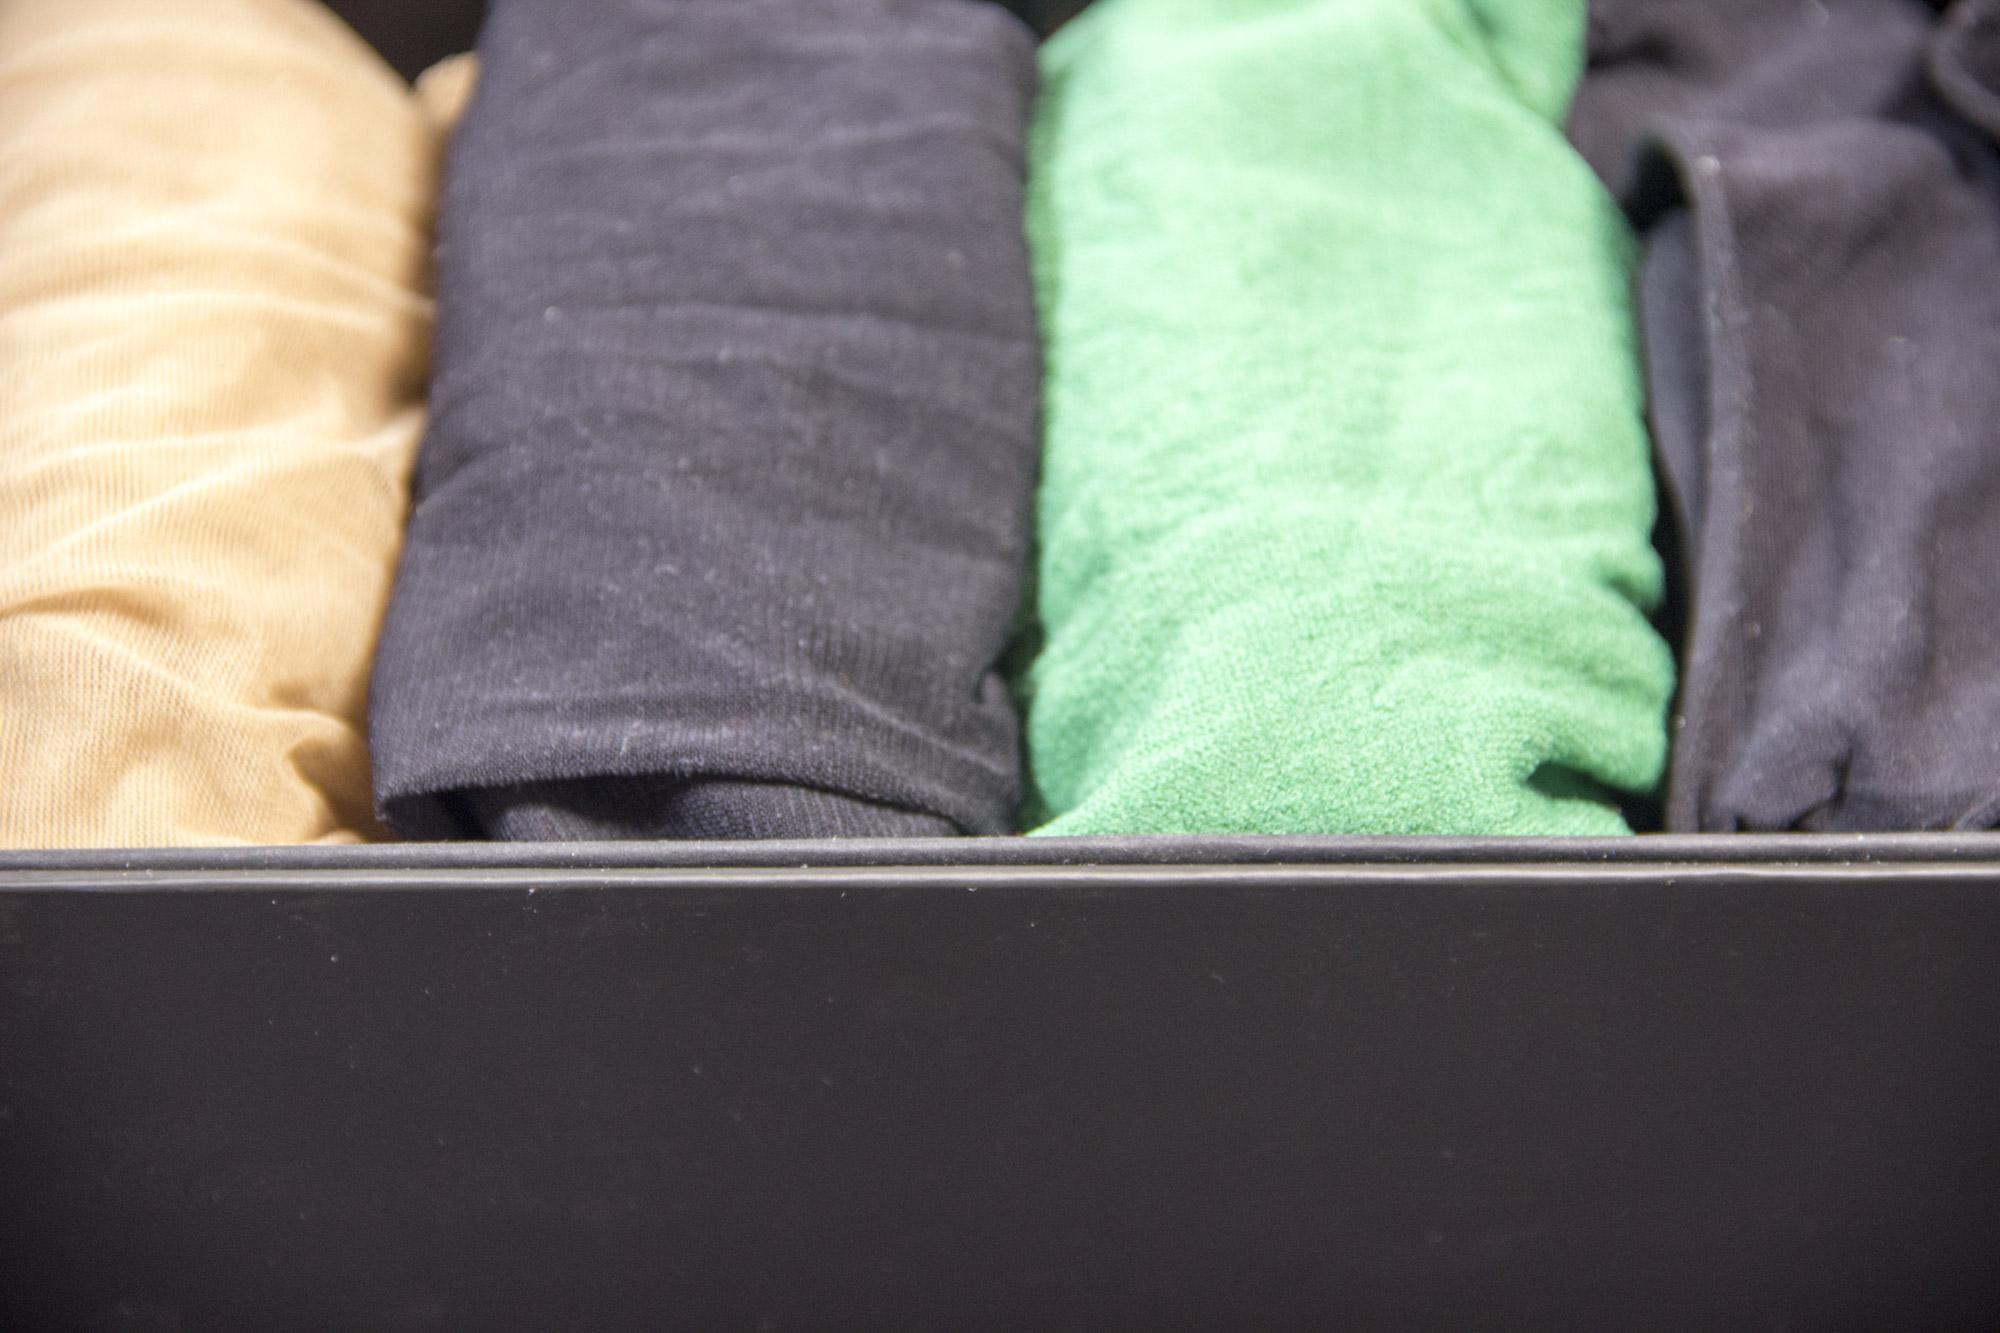 Как я организую нижнее белье. Коробка с чулками